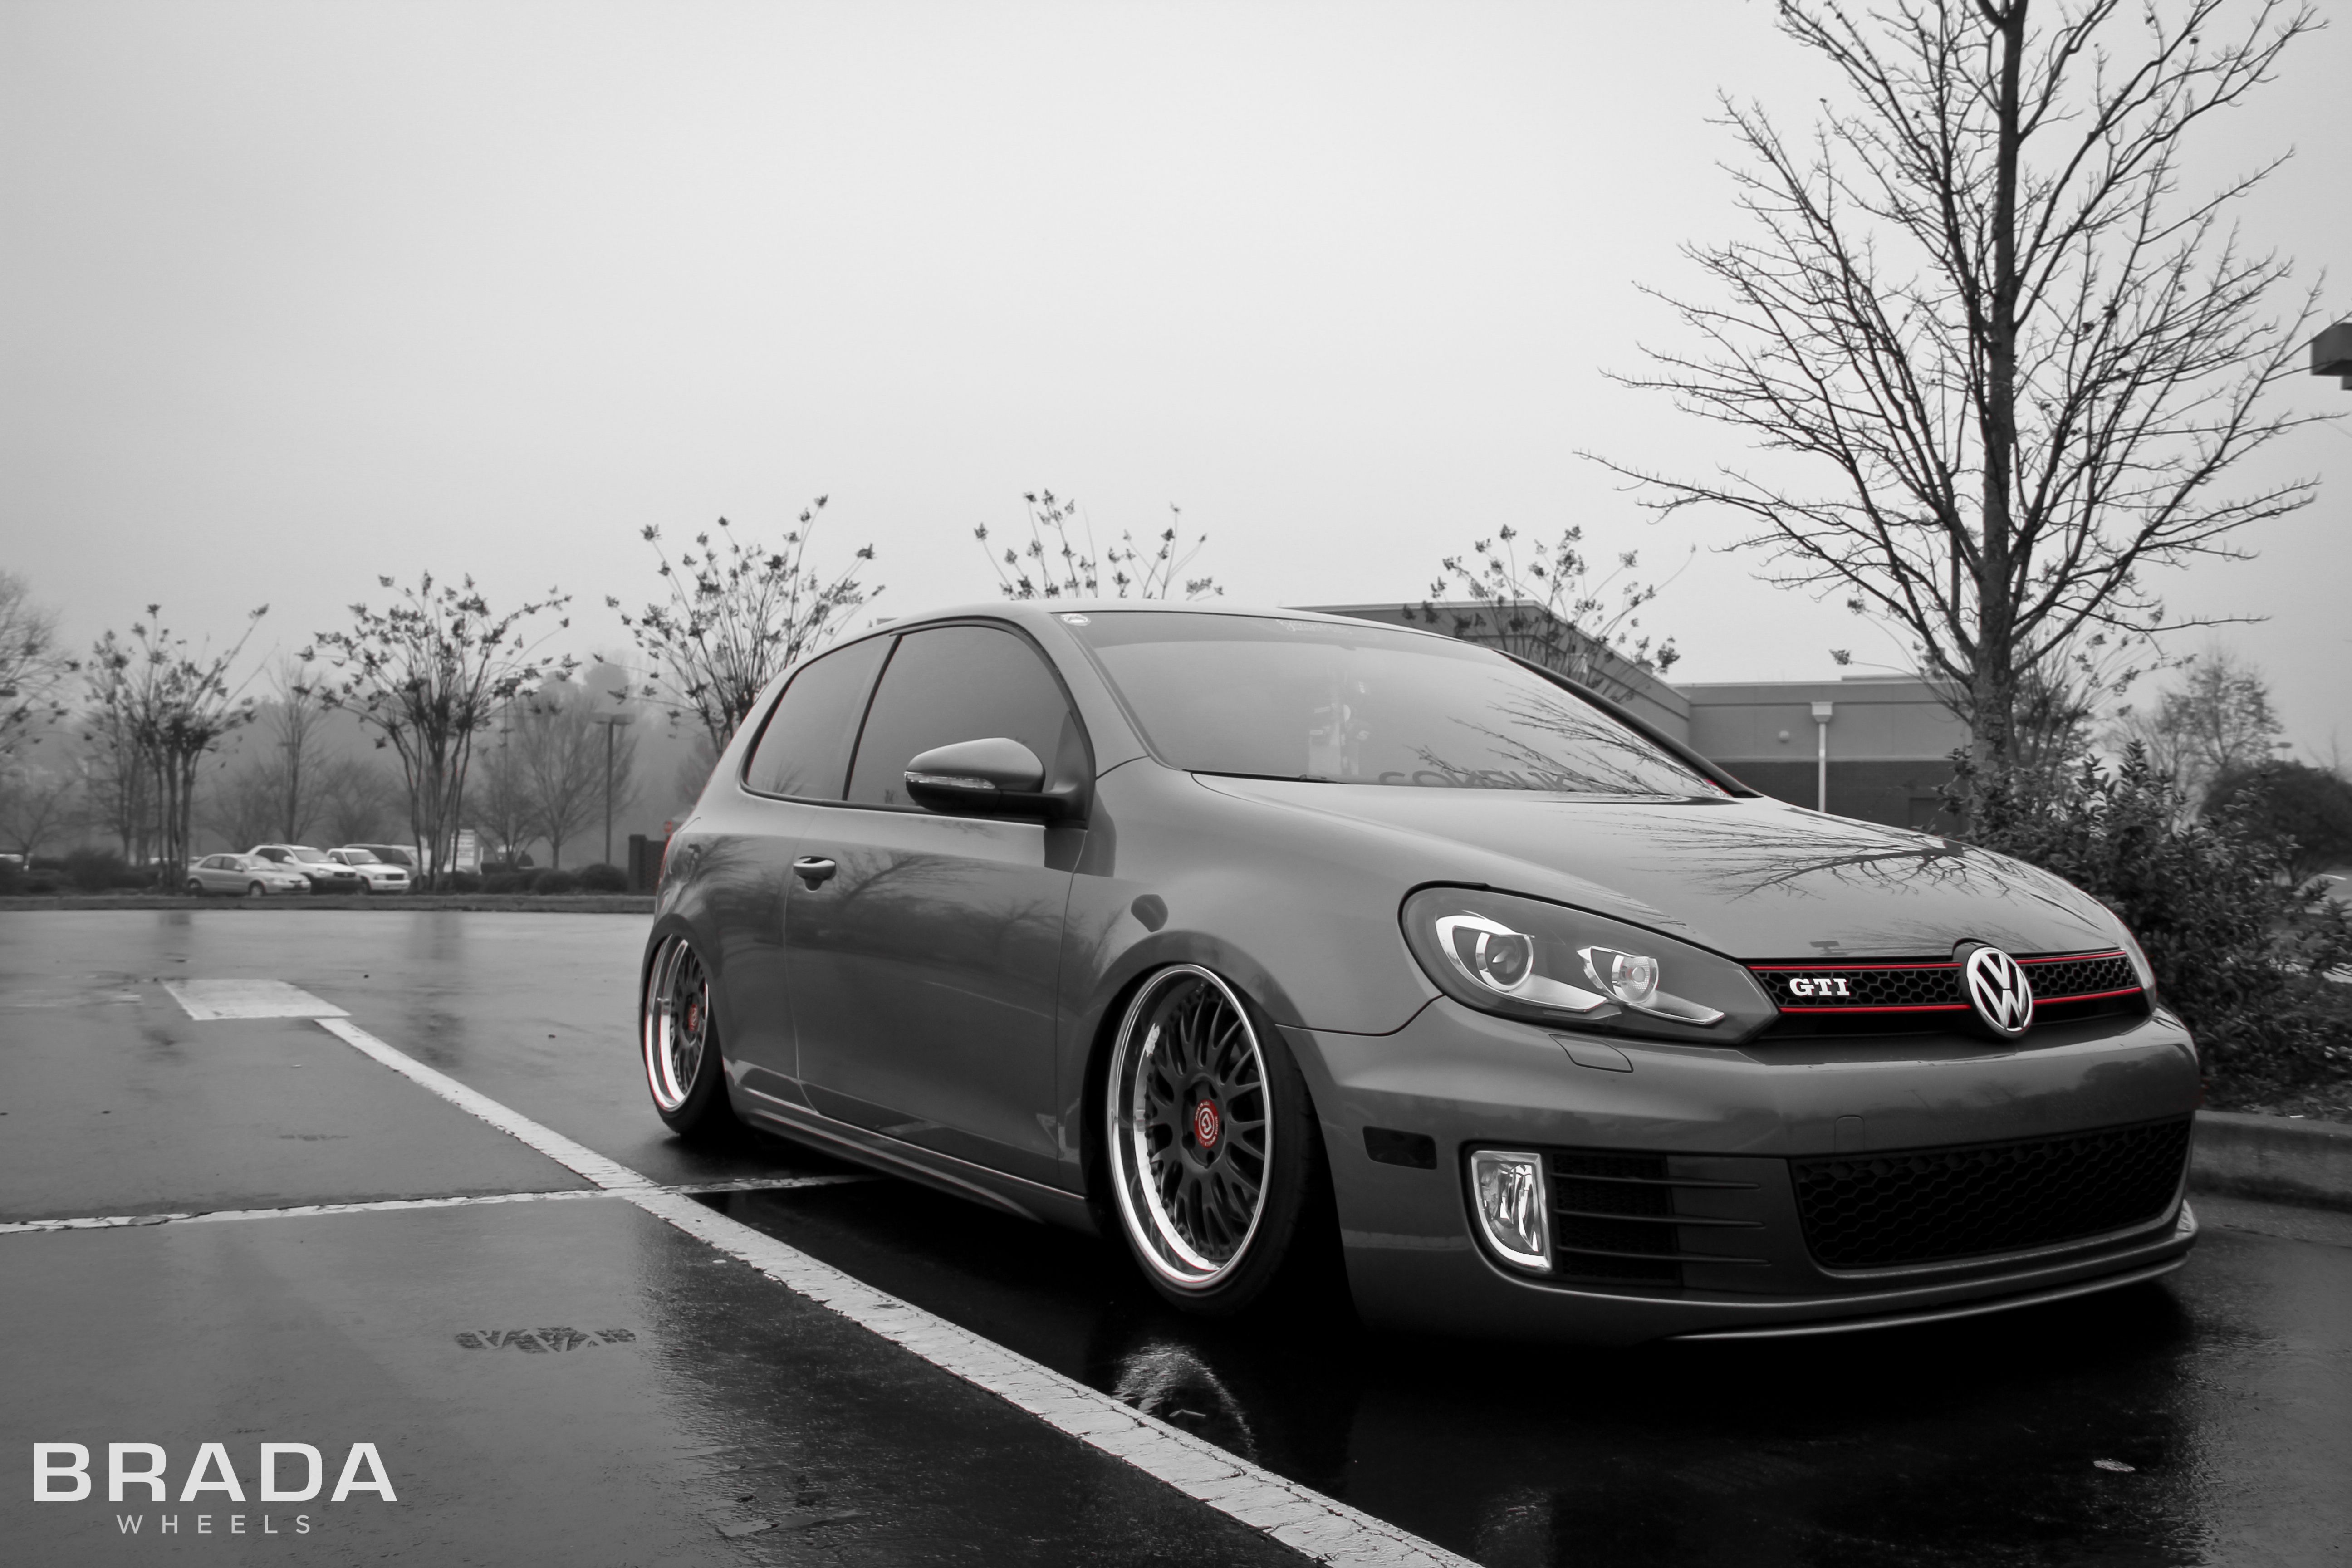 Vw golf r mk6 cars one love - Tumblr_lry20utpth1qeowauo1_500 Jpg 500 309 Gti Pinterest Volkswagen Cars And Wheels